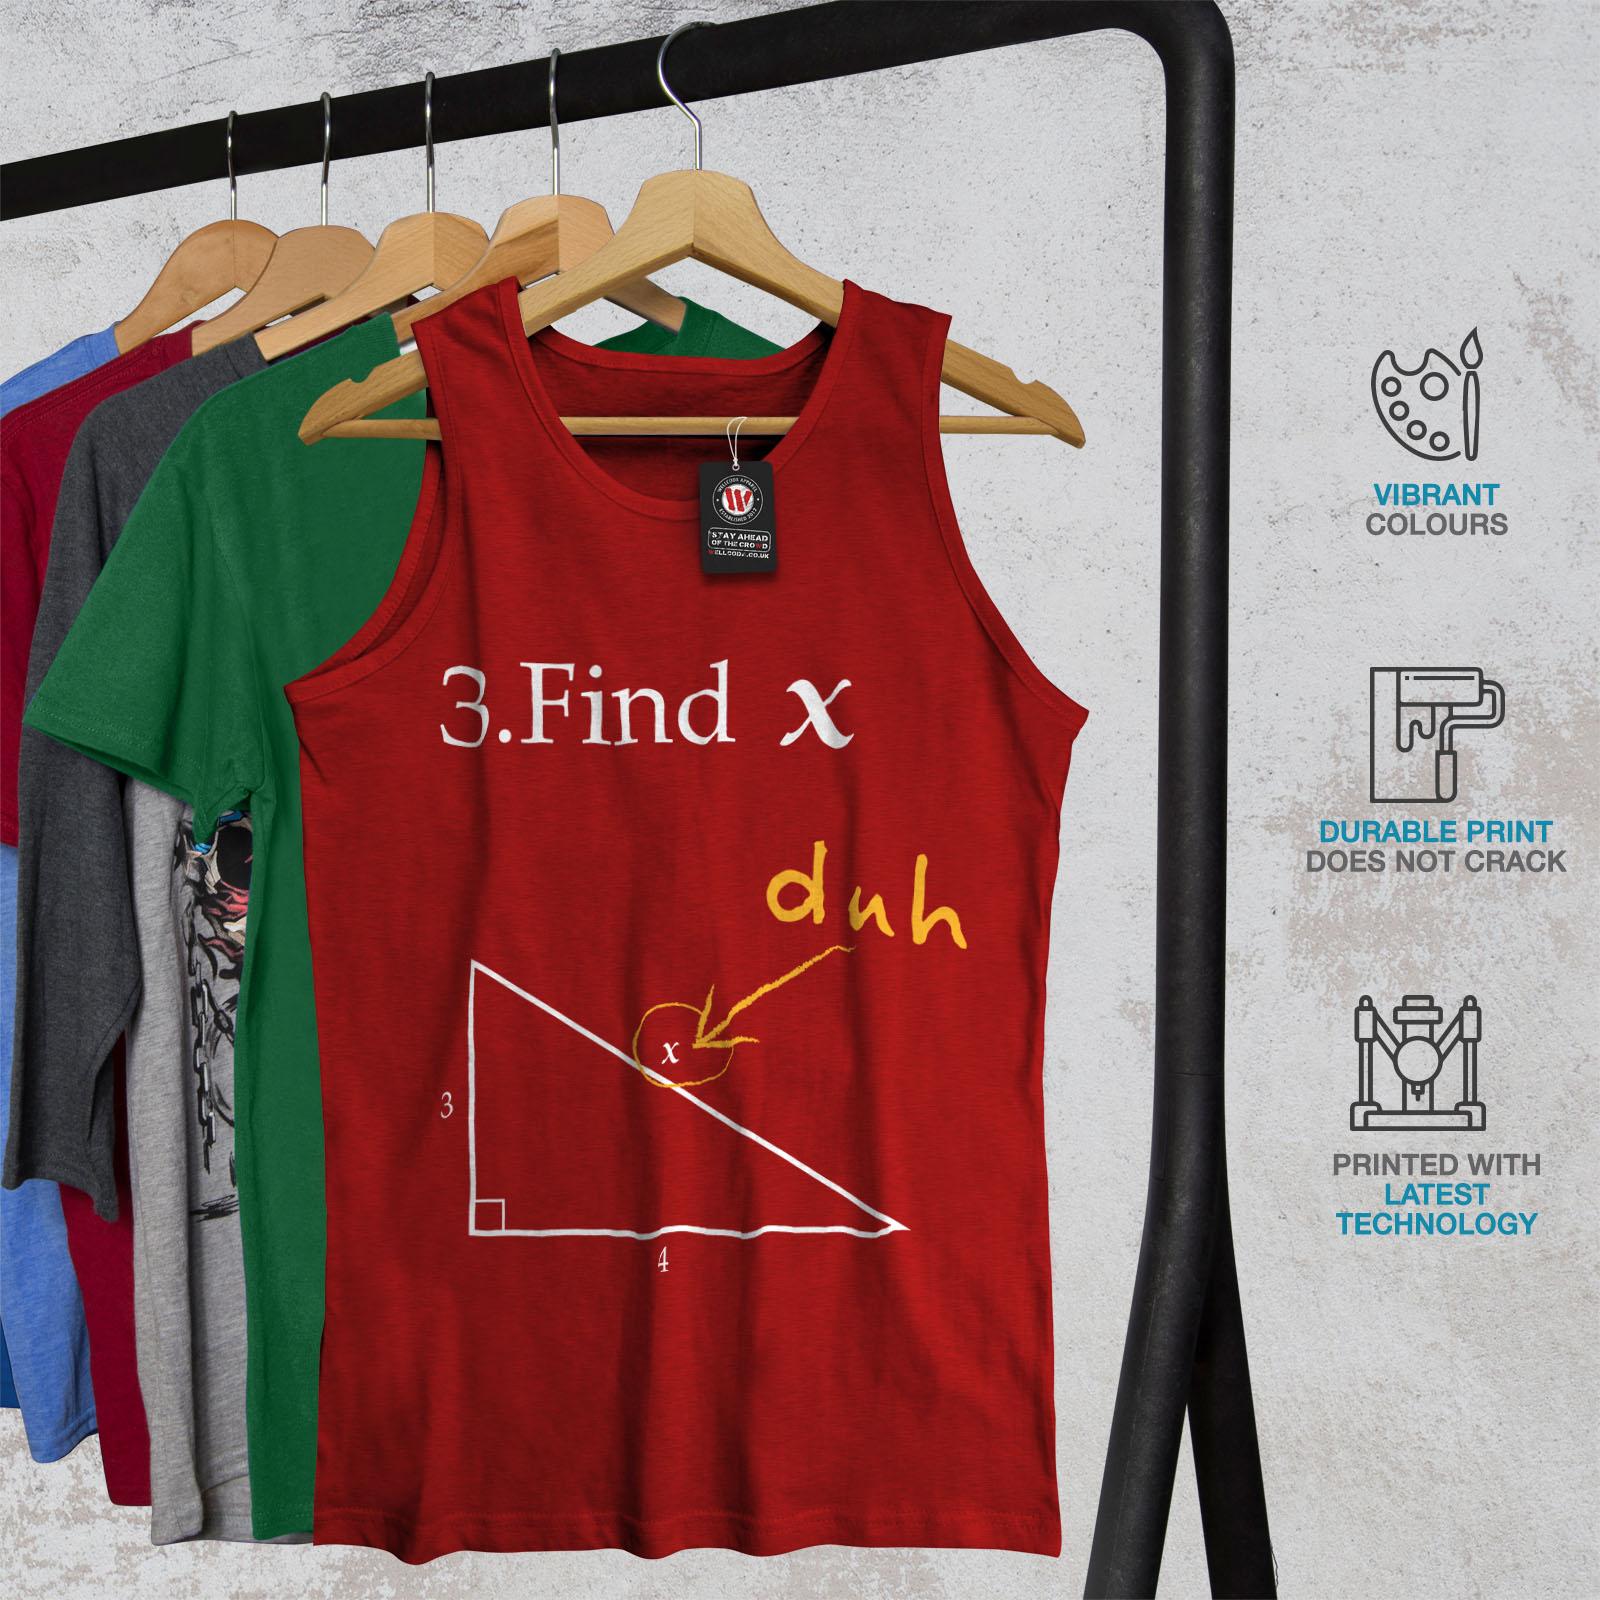 Wellcoda-trouver-X-Homme-Tank-Top-Drole-Math-Active-Sports-Shirt miniature 8